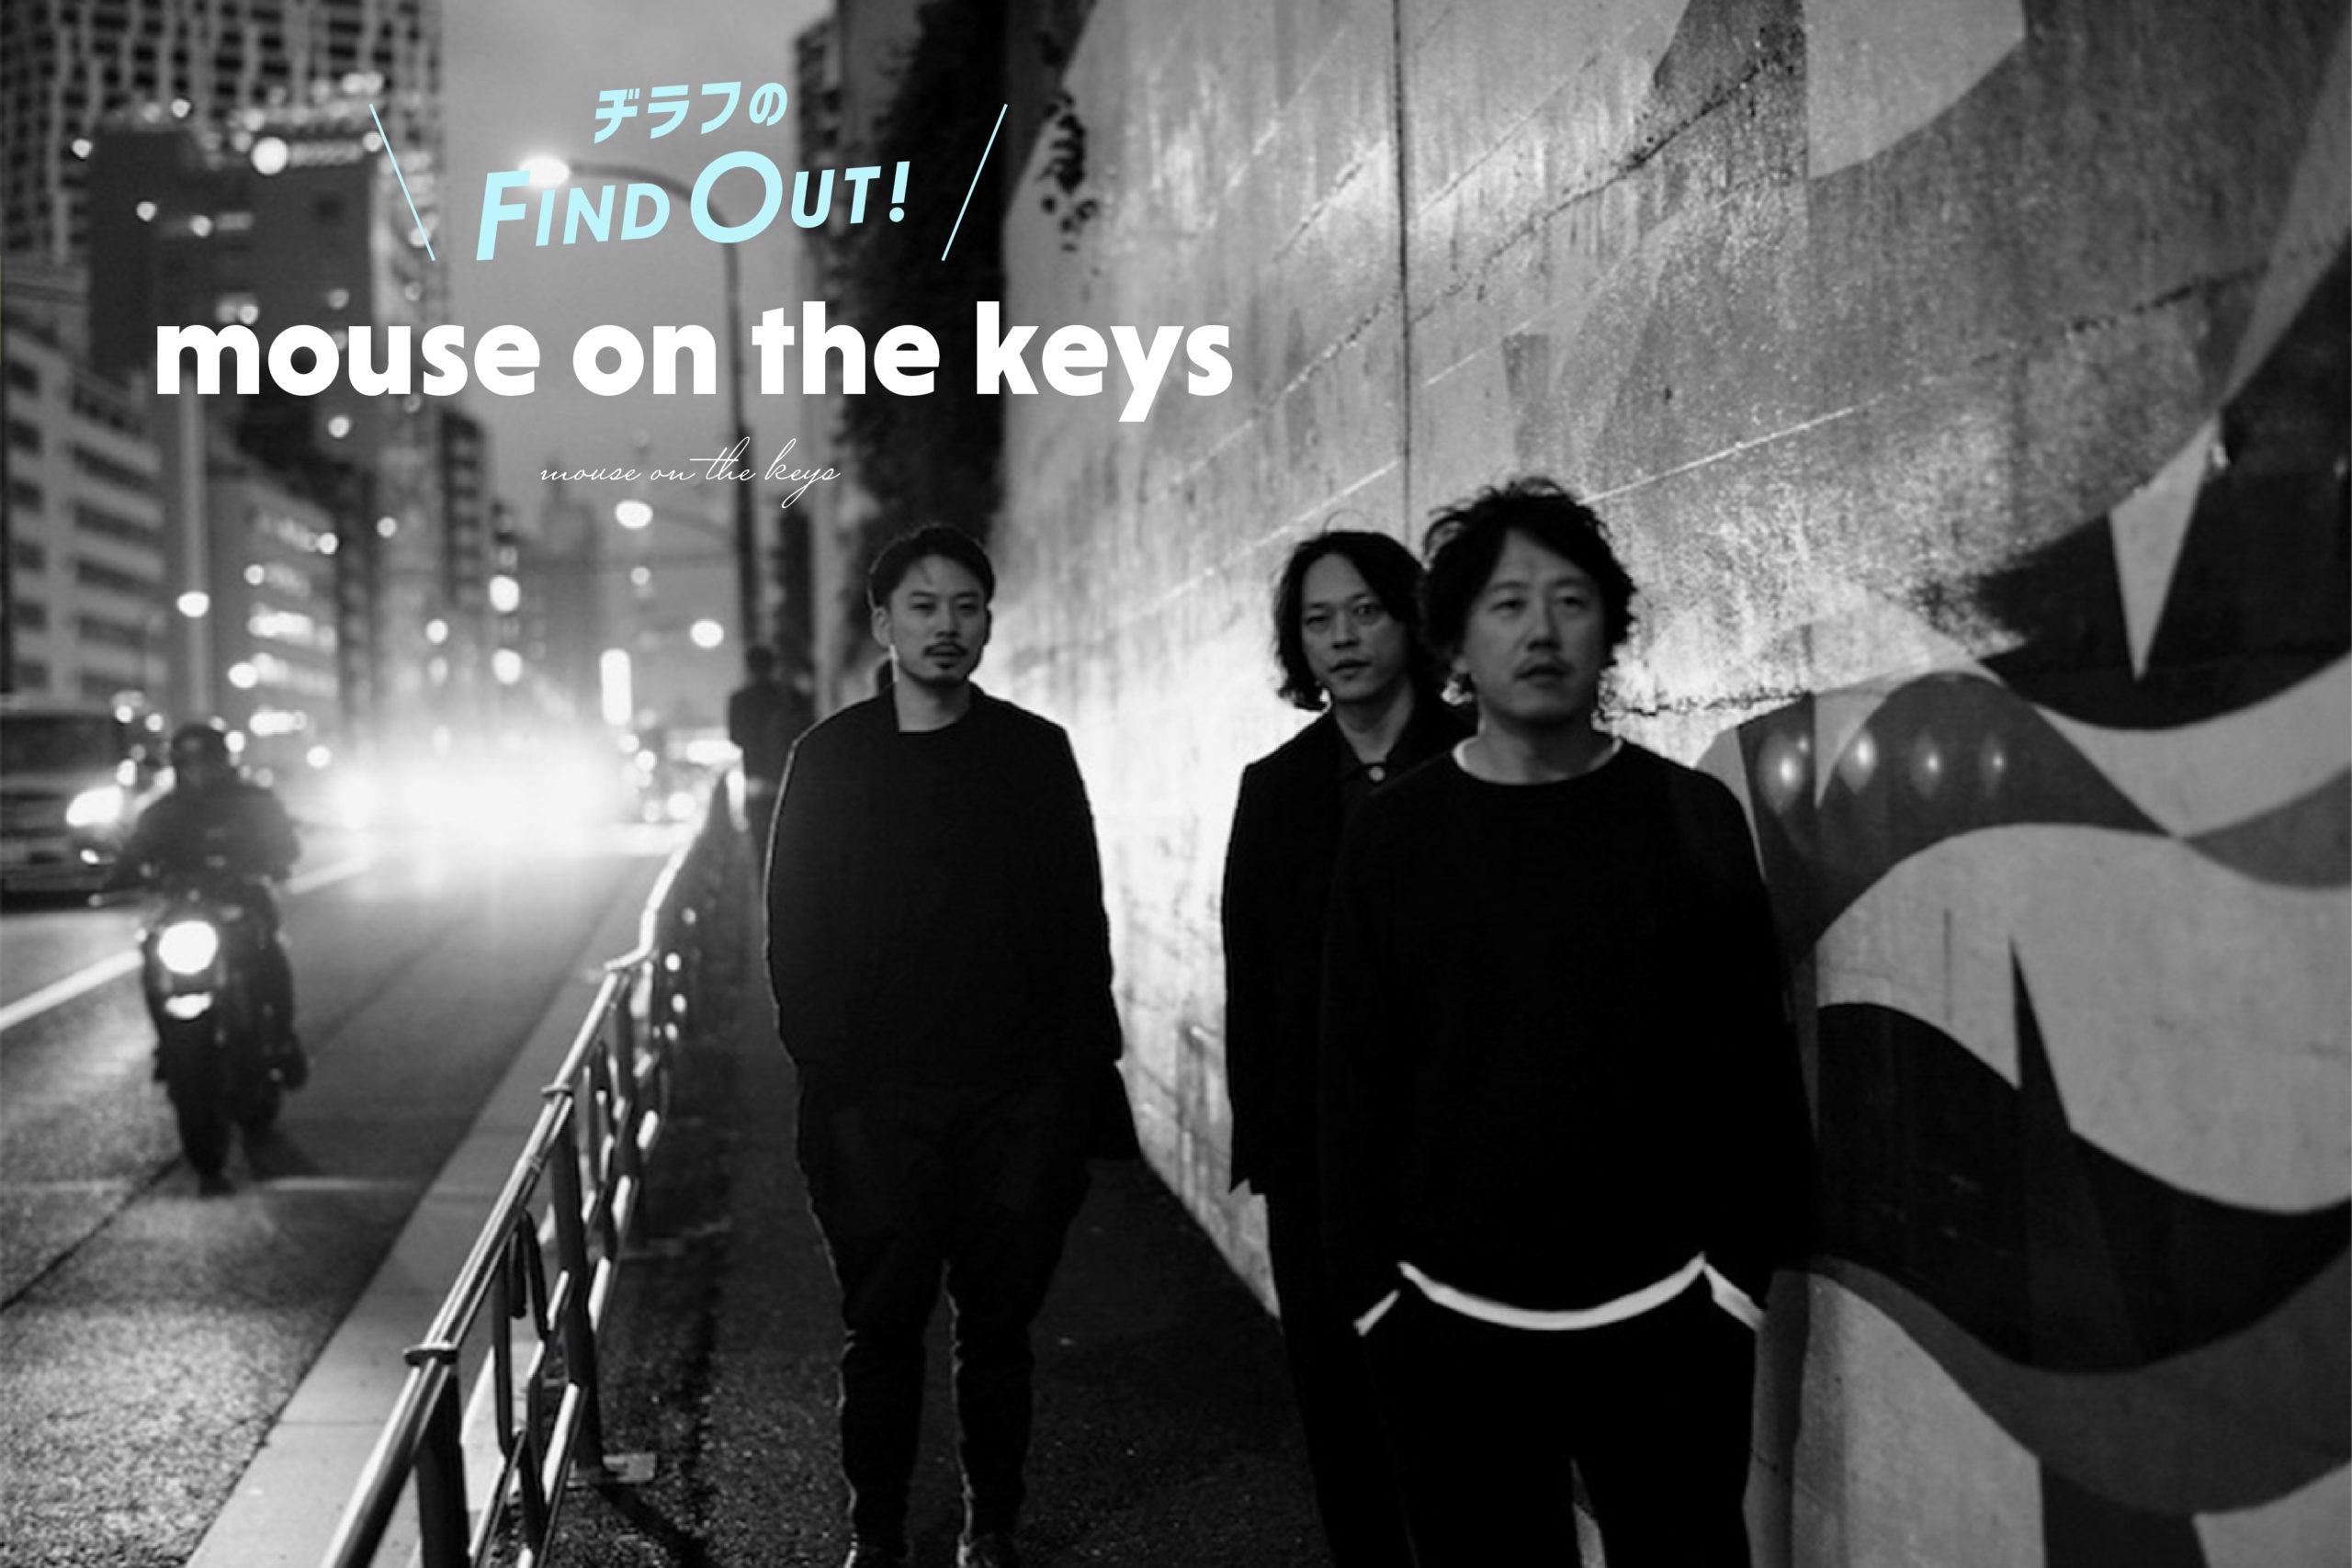 「【mouse on the keys】困難を乗り越えて発表された新作EP『Arche』」のアイキャッチ画像